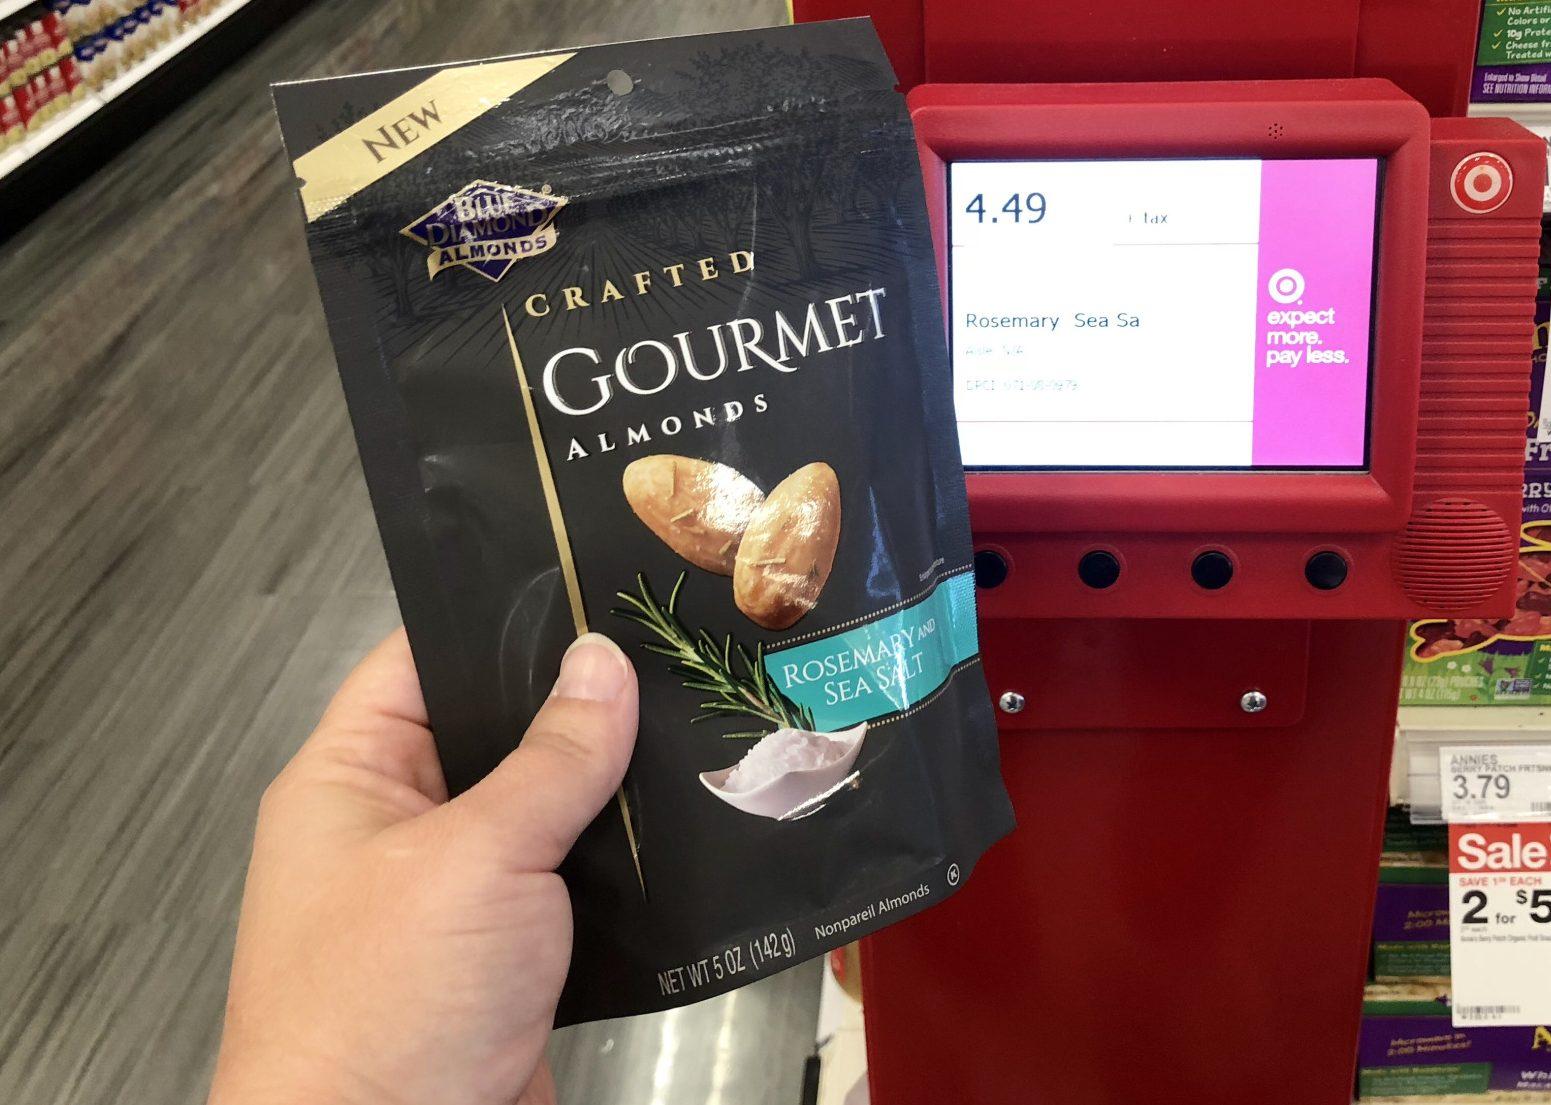 blue diamond gourmet almonds - Scanning the deal at Target